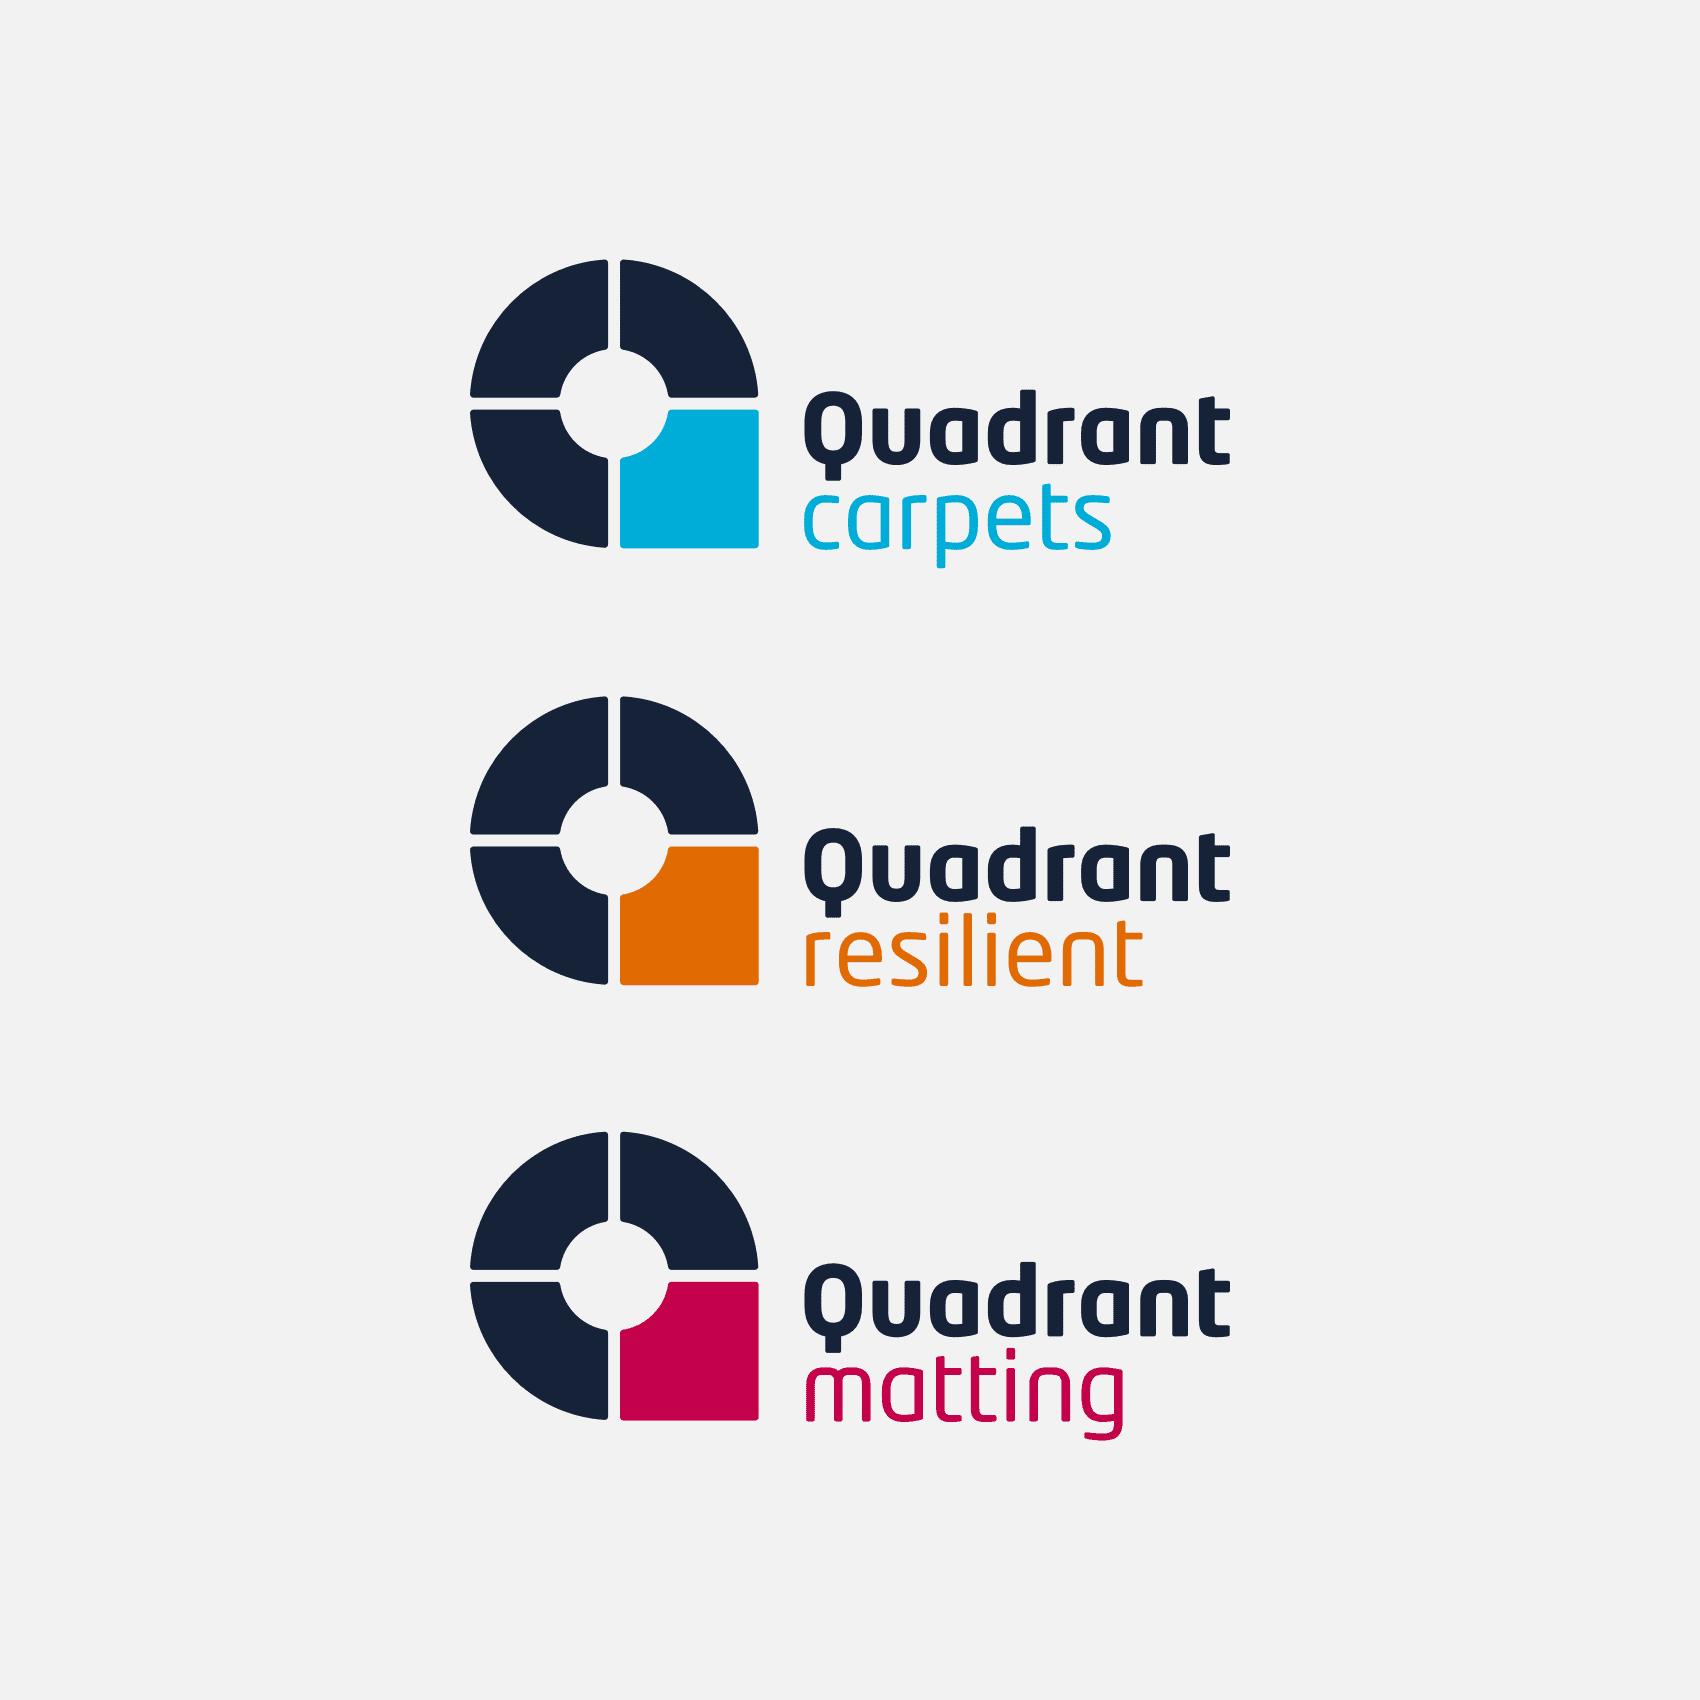 Quadrant brand architecture